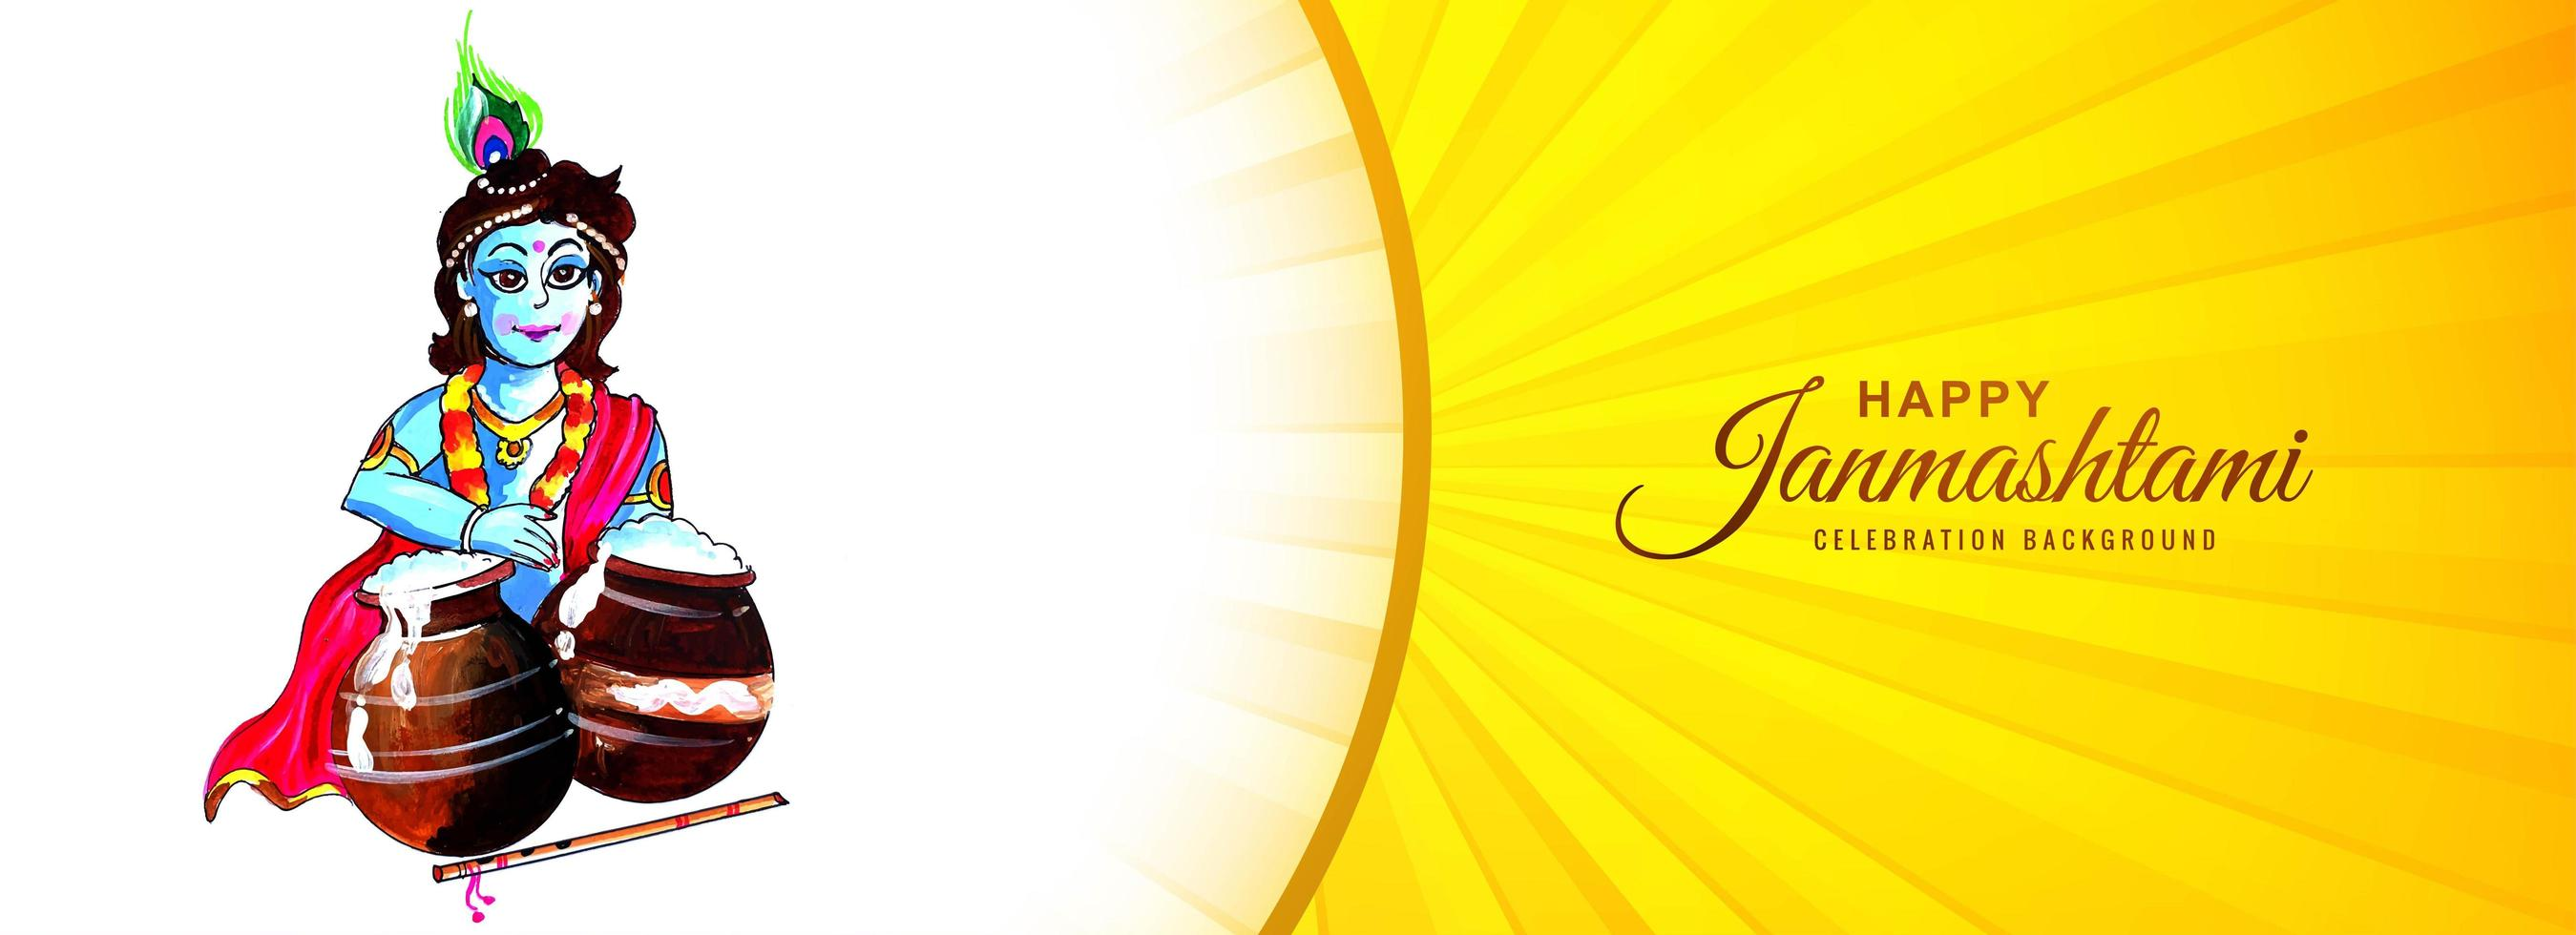 dahi handi krishna janmashtami gul sunburst banner vektor